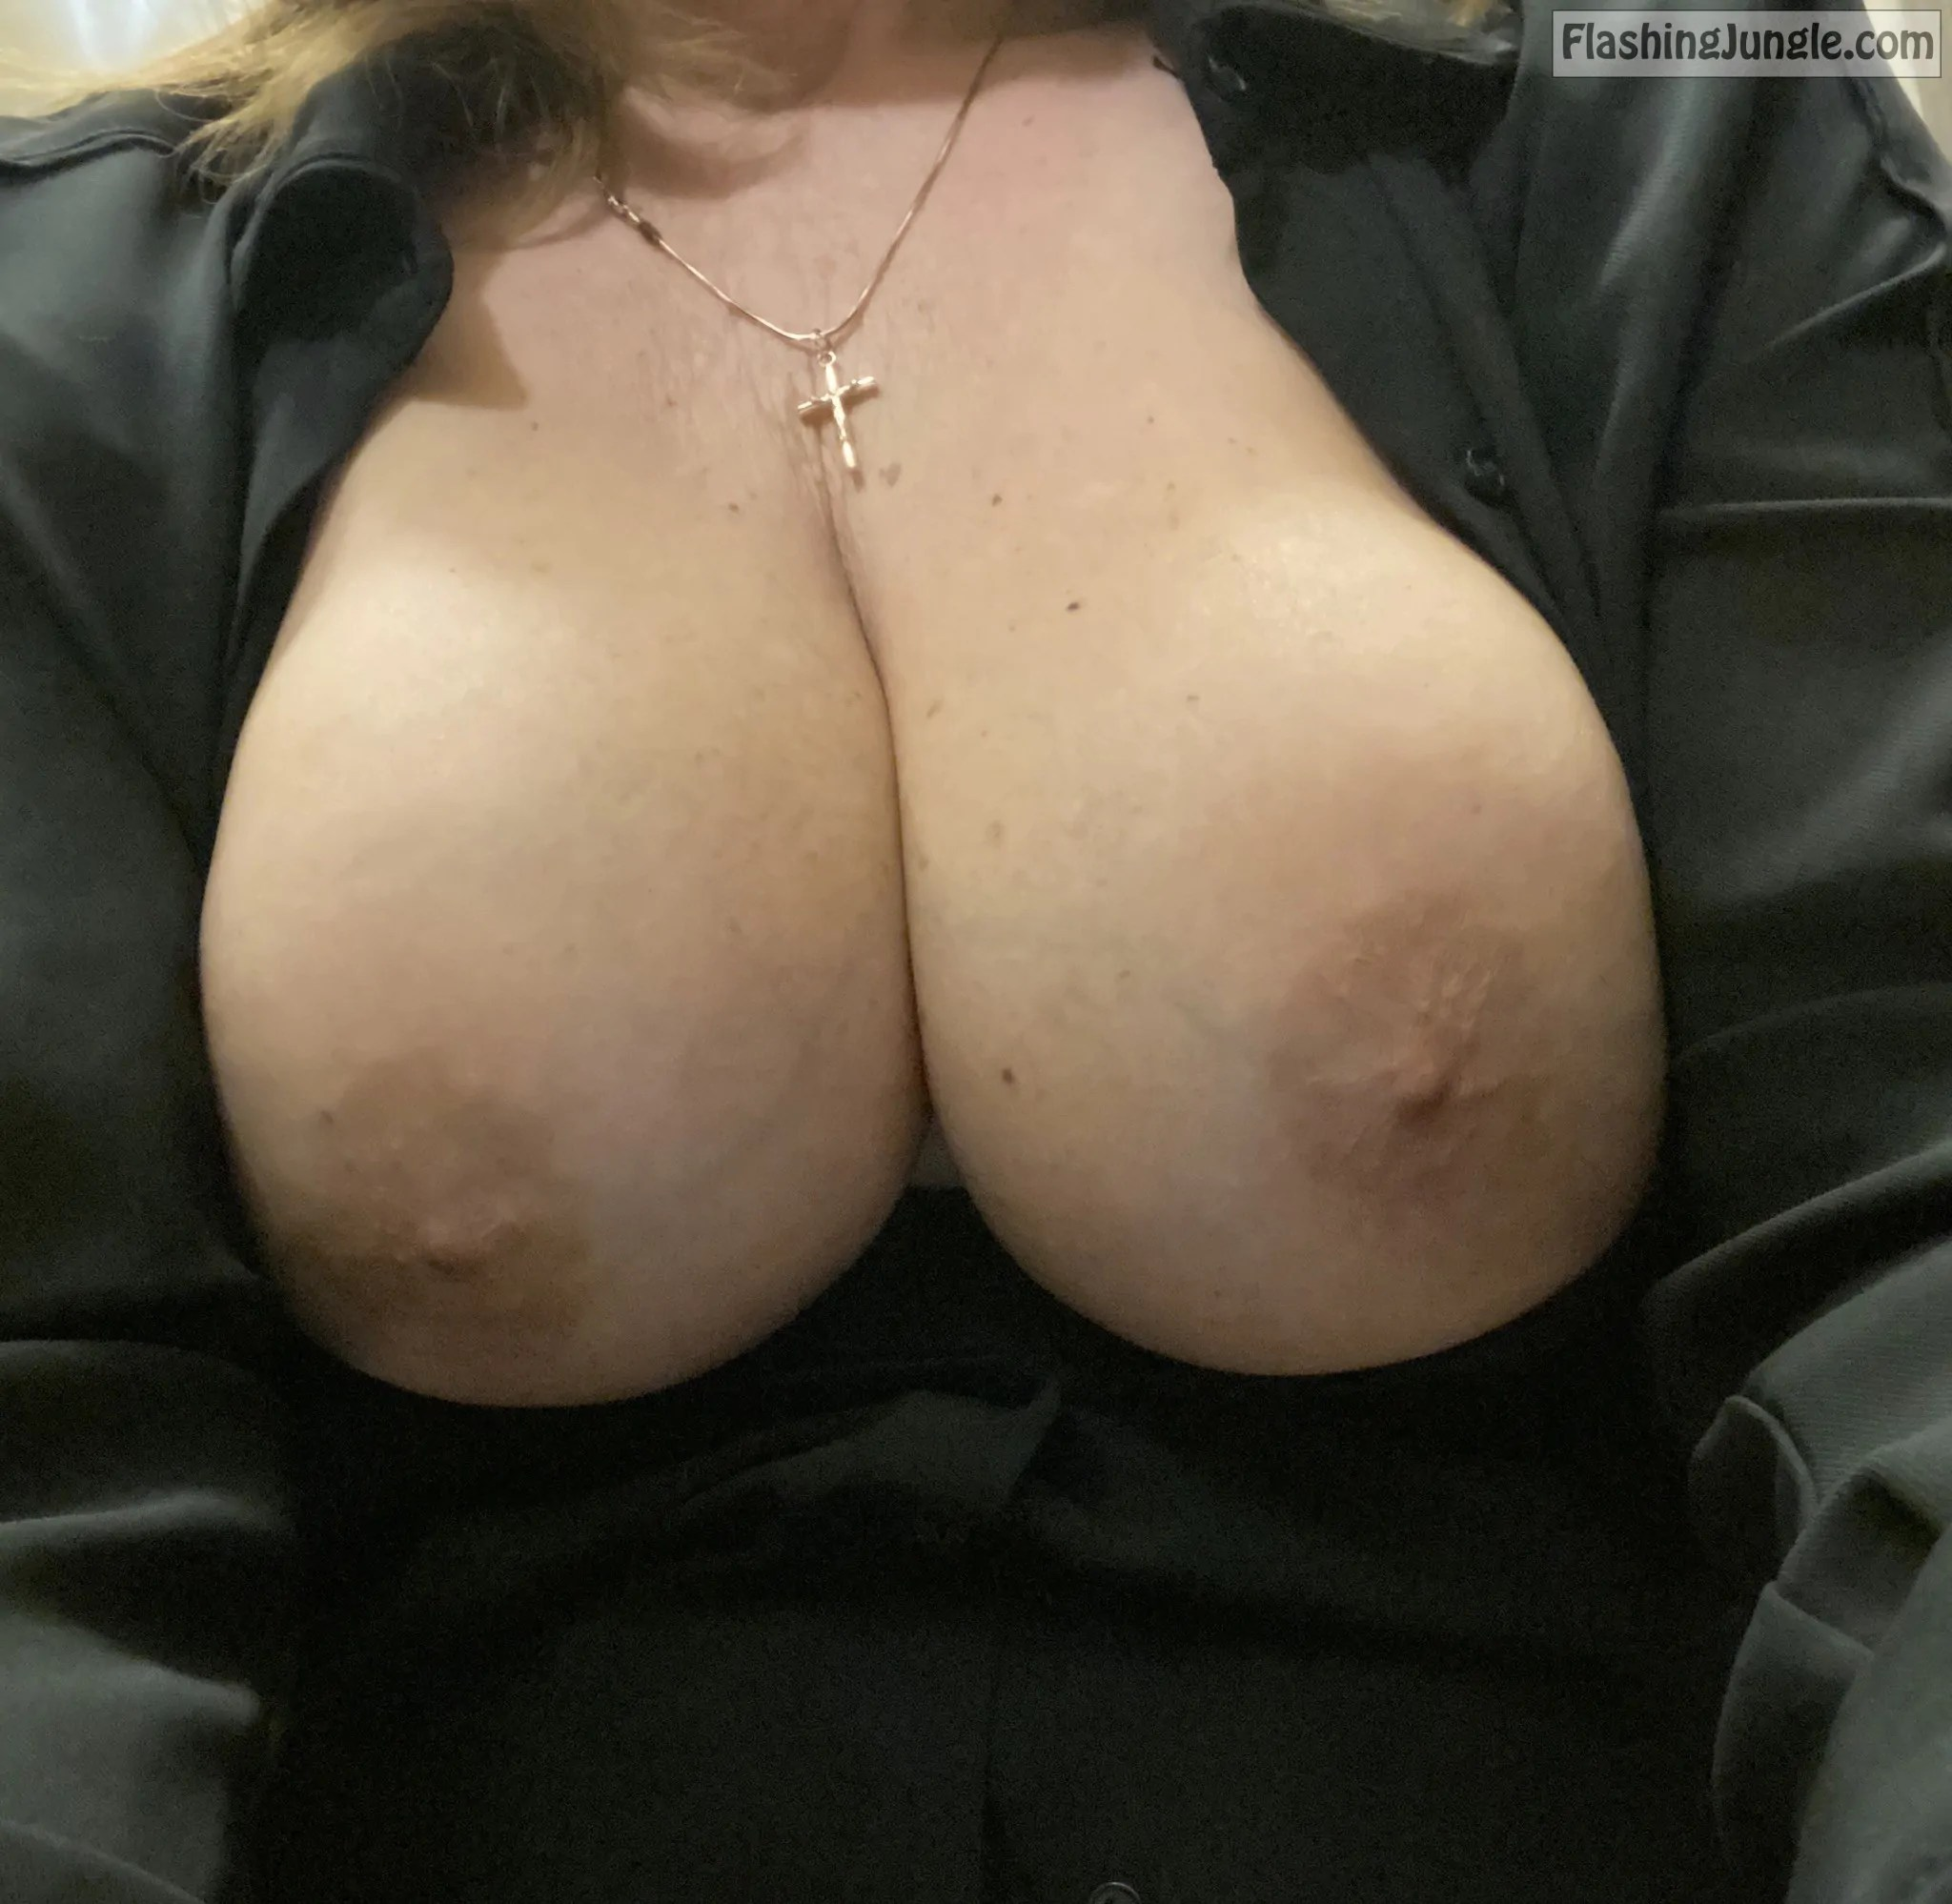 juicy nipples tumblr